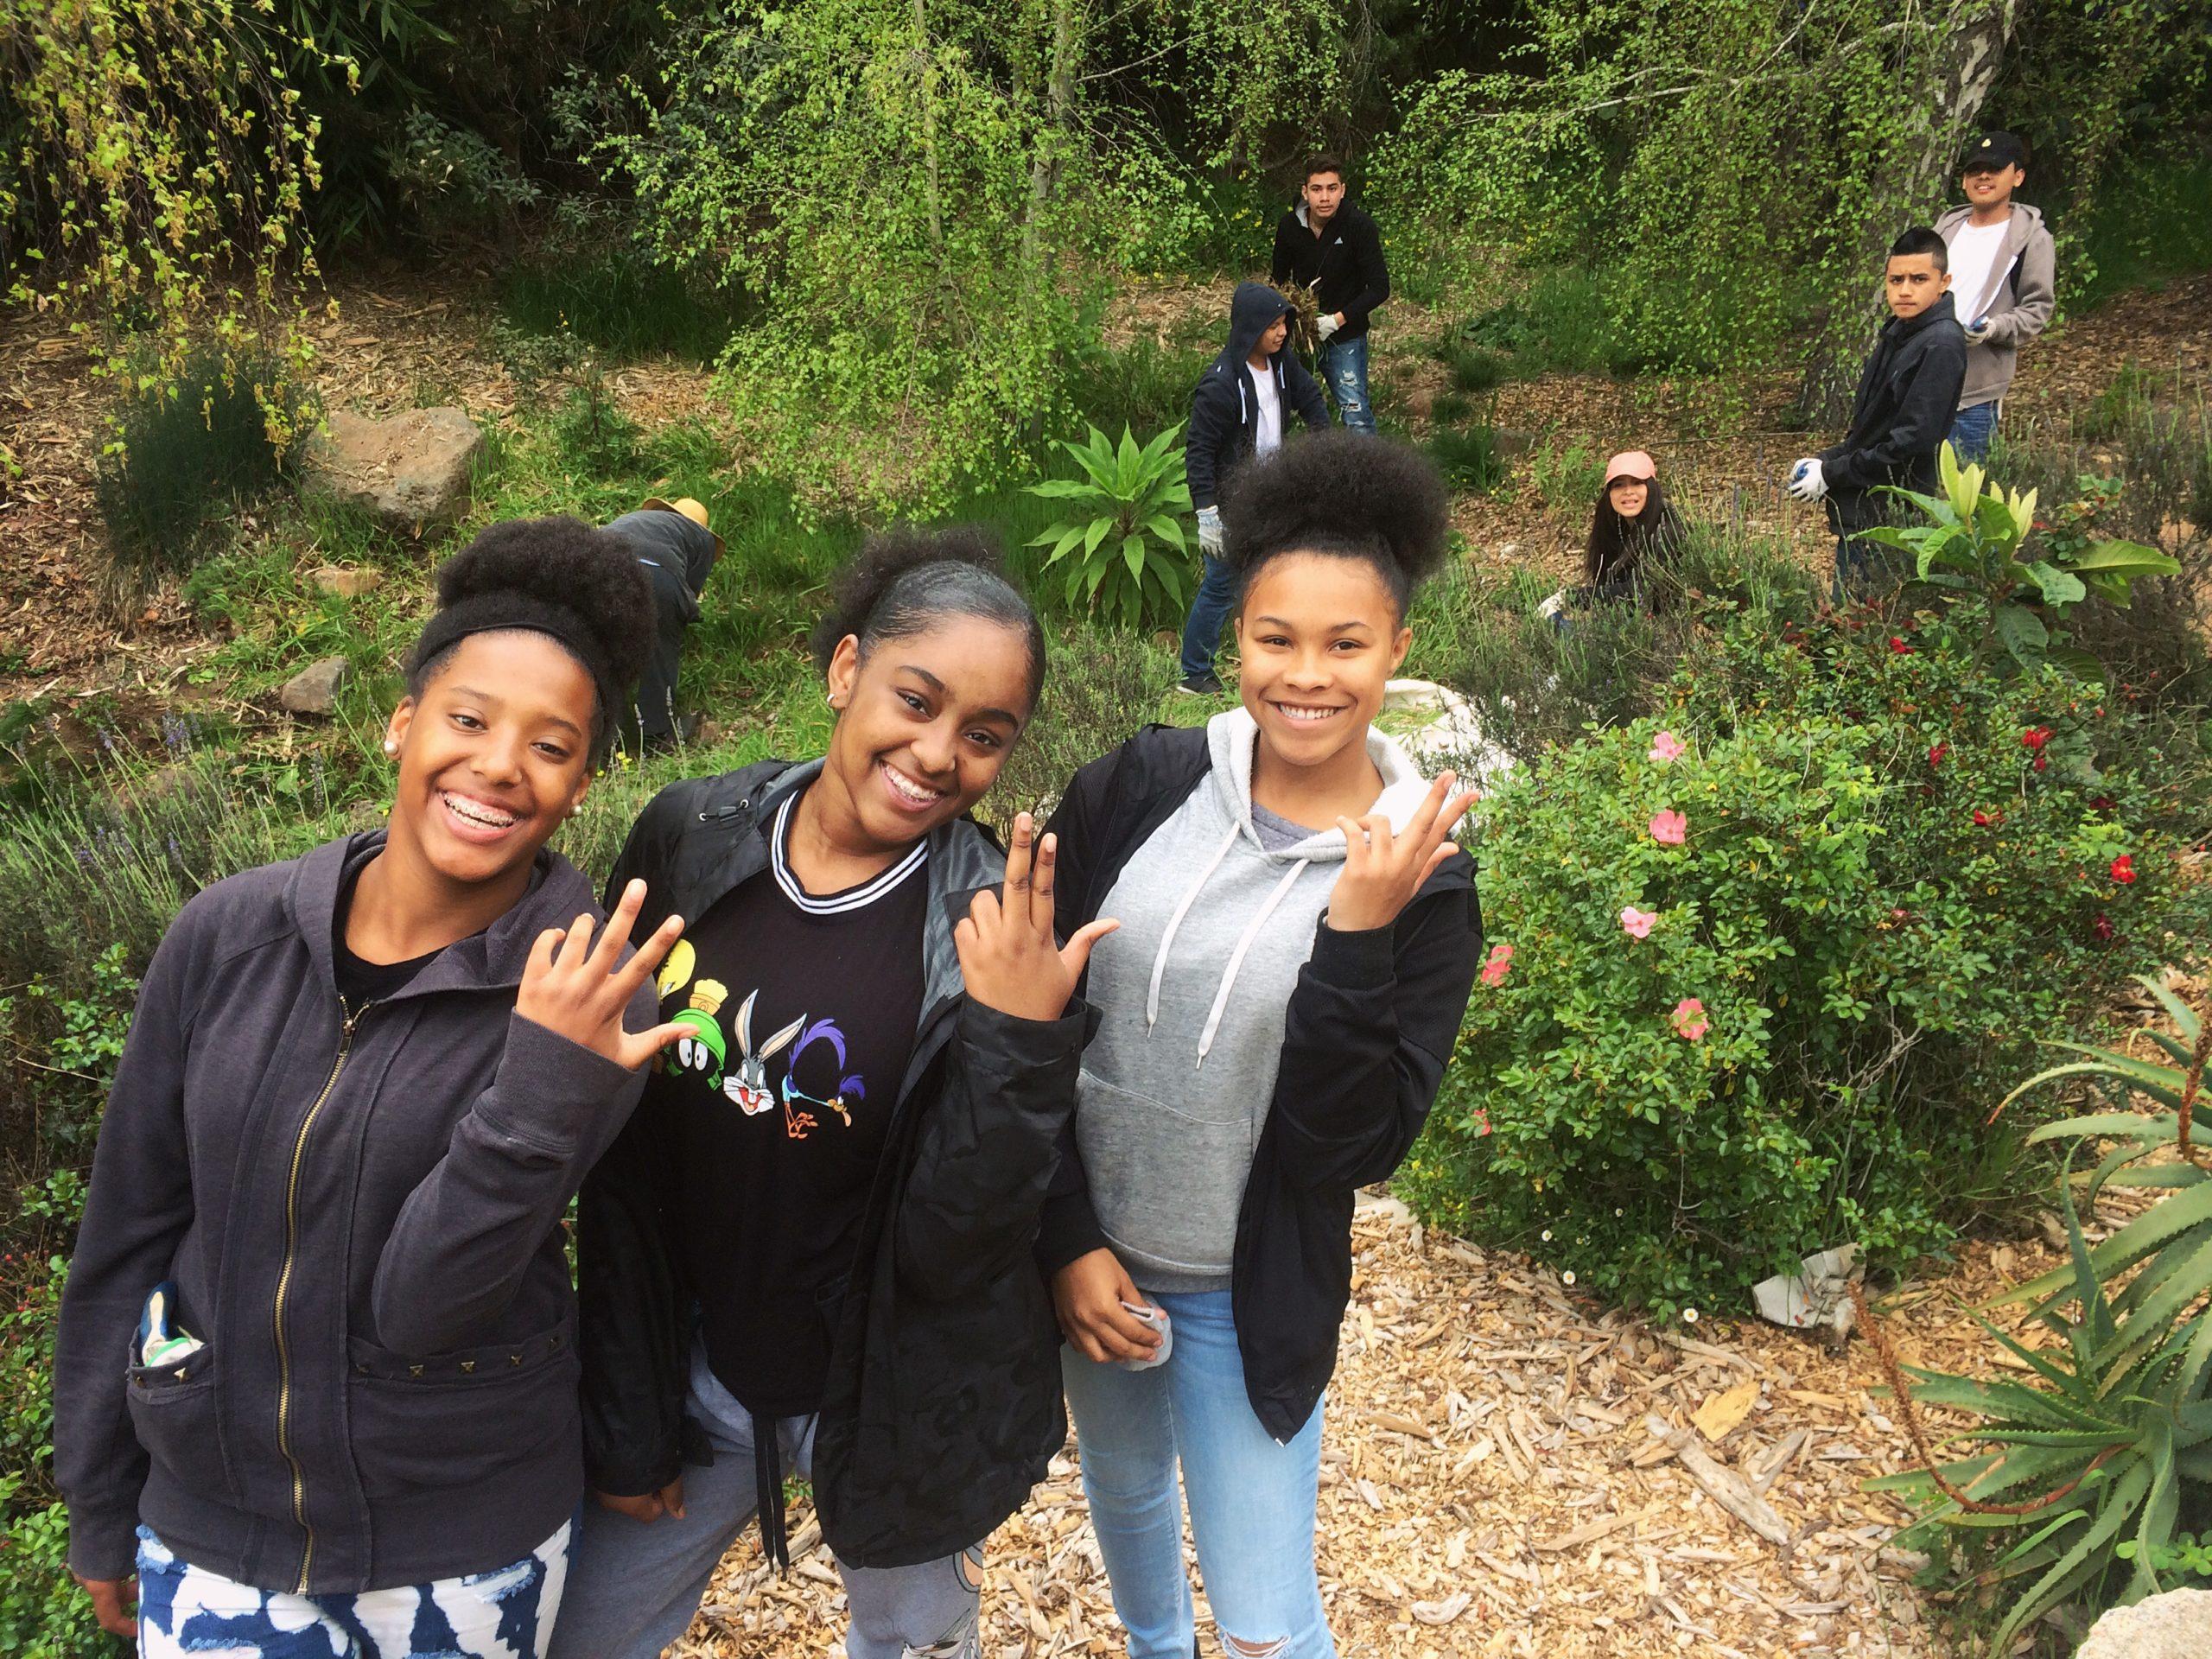 Vis Valley Greenway_LHS students Kionna, Erica, Heavynlei